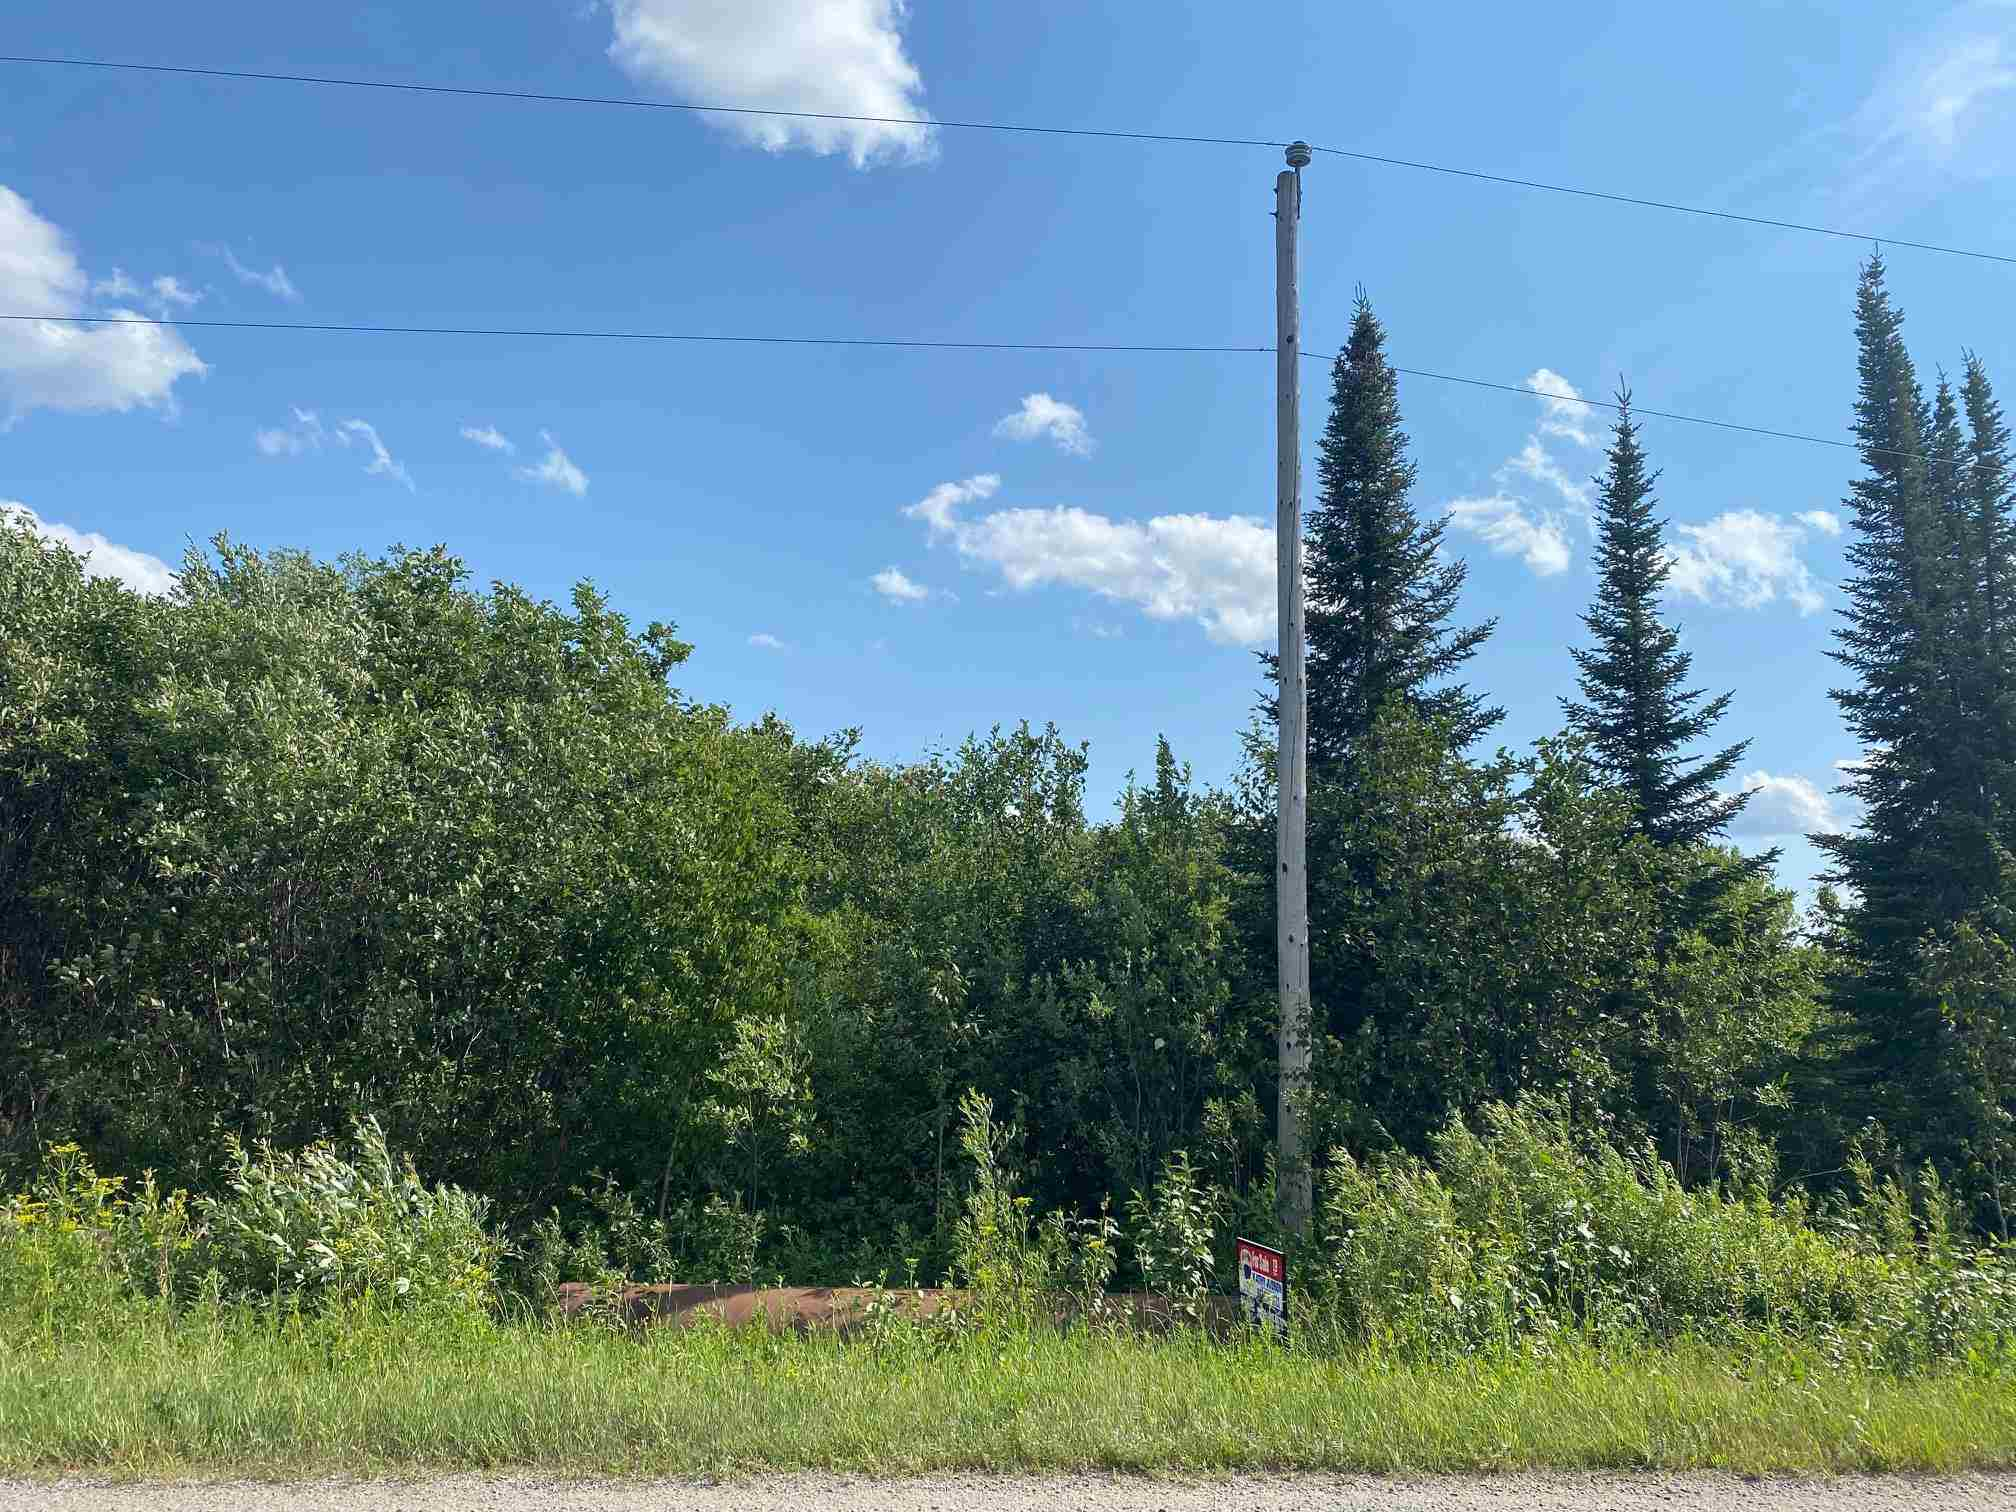 PT LT 9 Bone Road, Alberton, Ontario (ID TB211910)